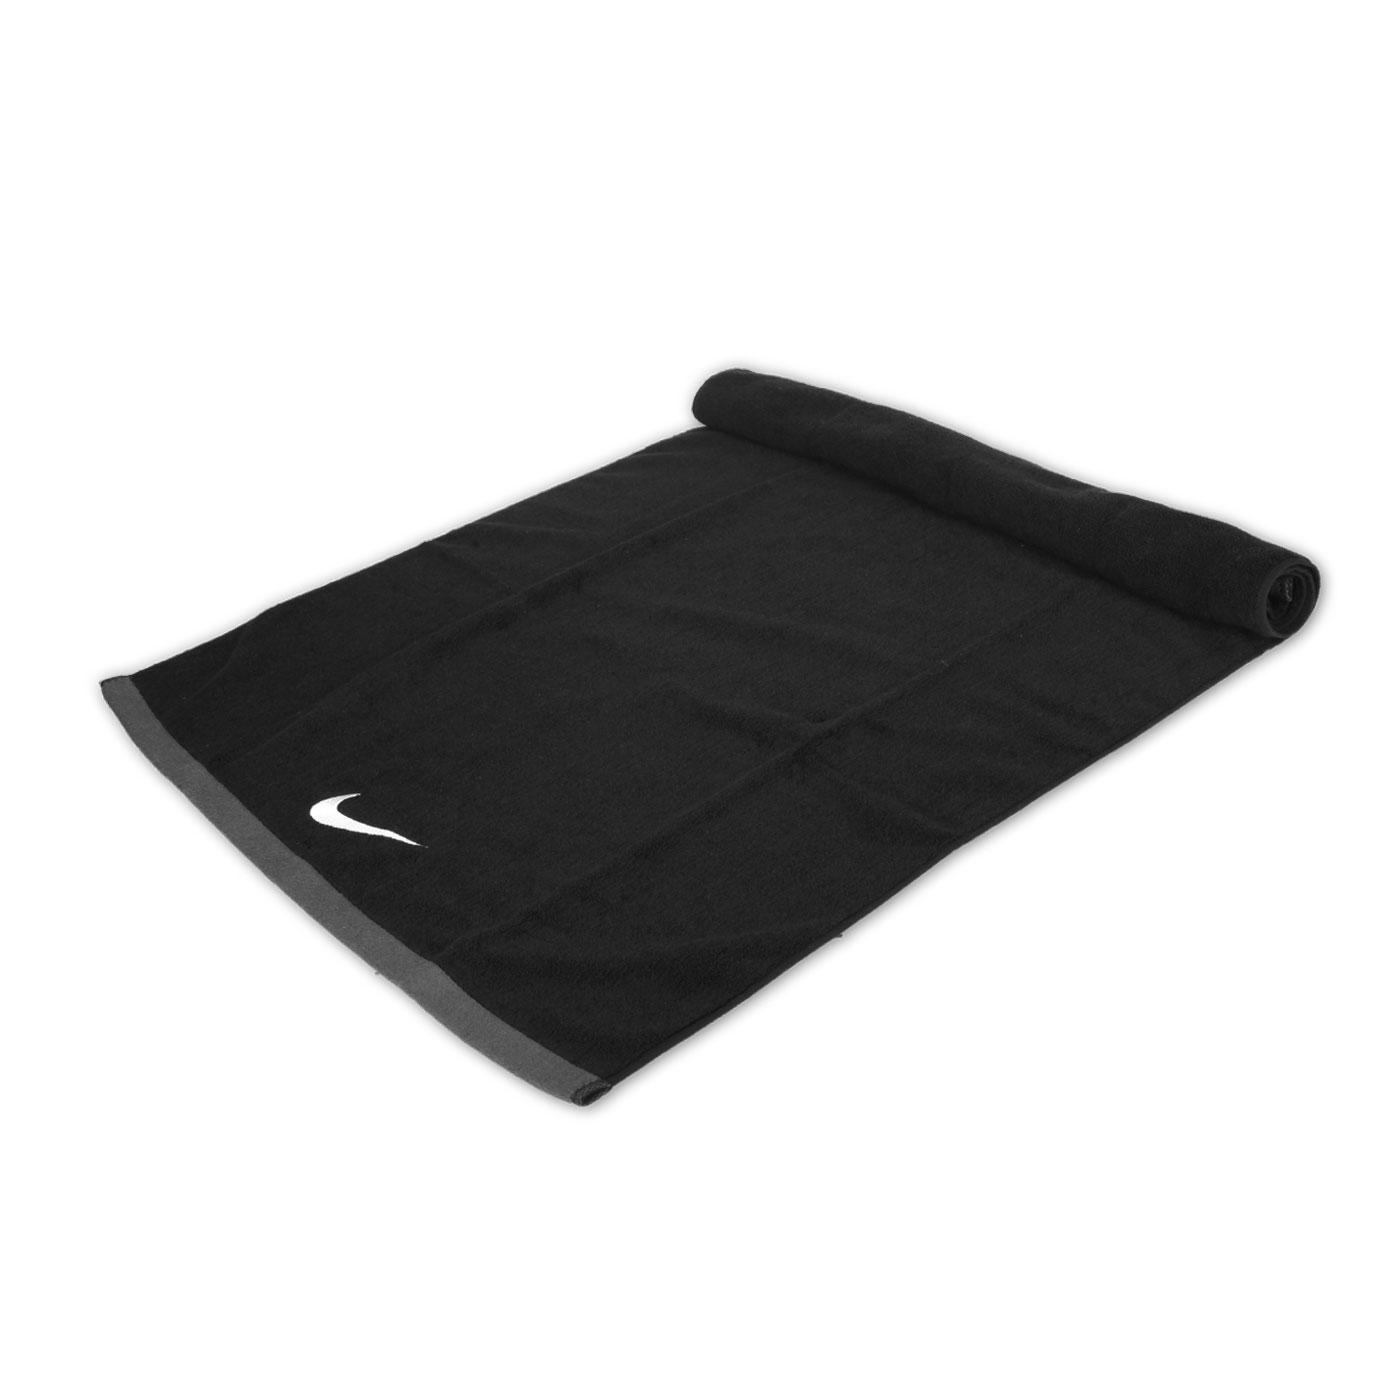 NIKE 運動大浴巾(60*120cm) N1001522010LG - 黑灰白